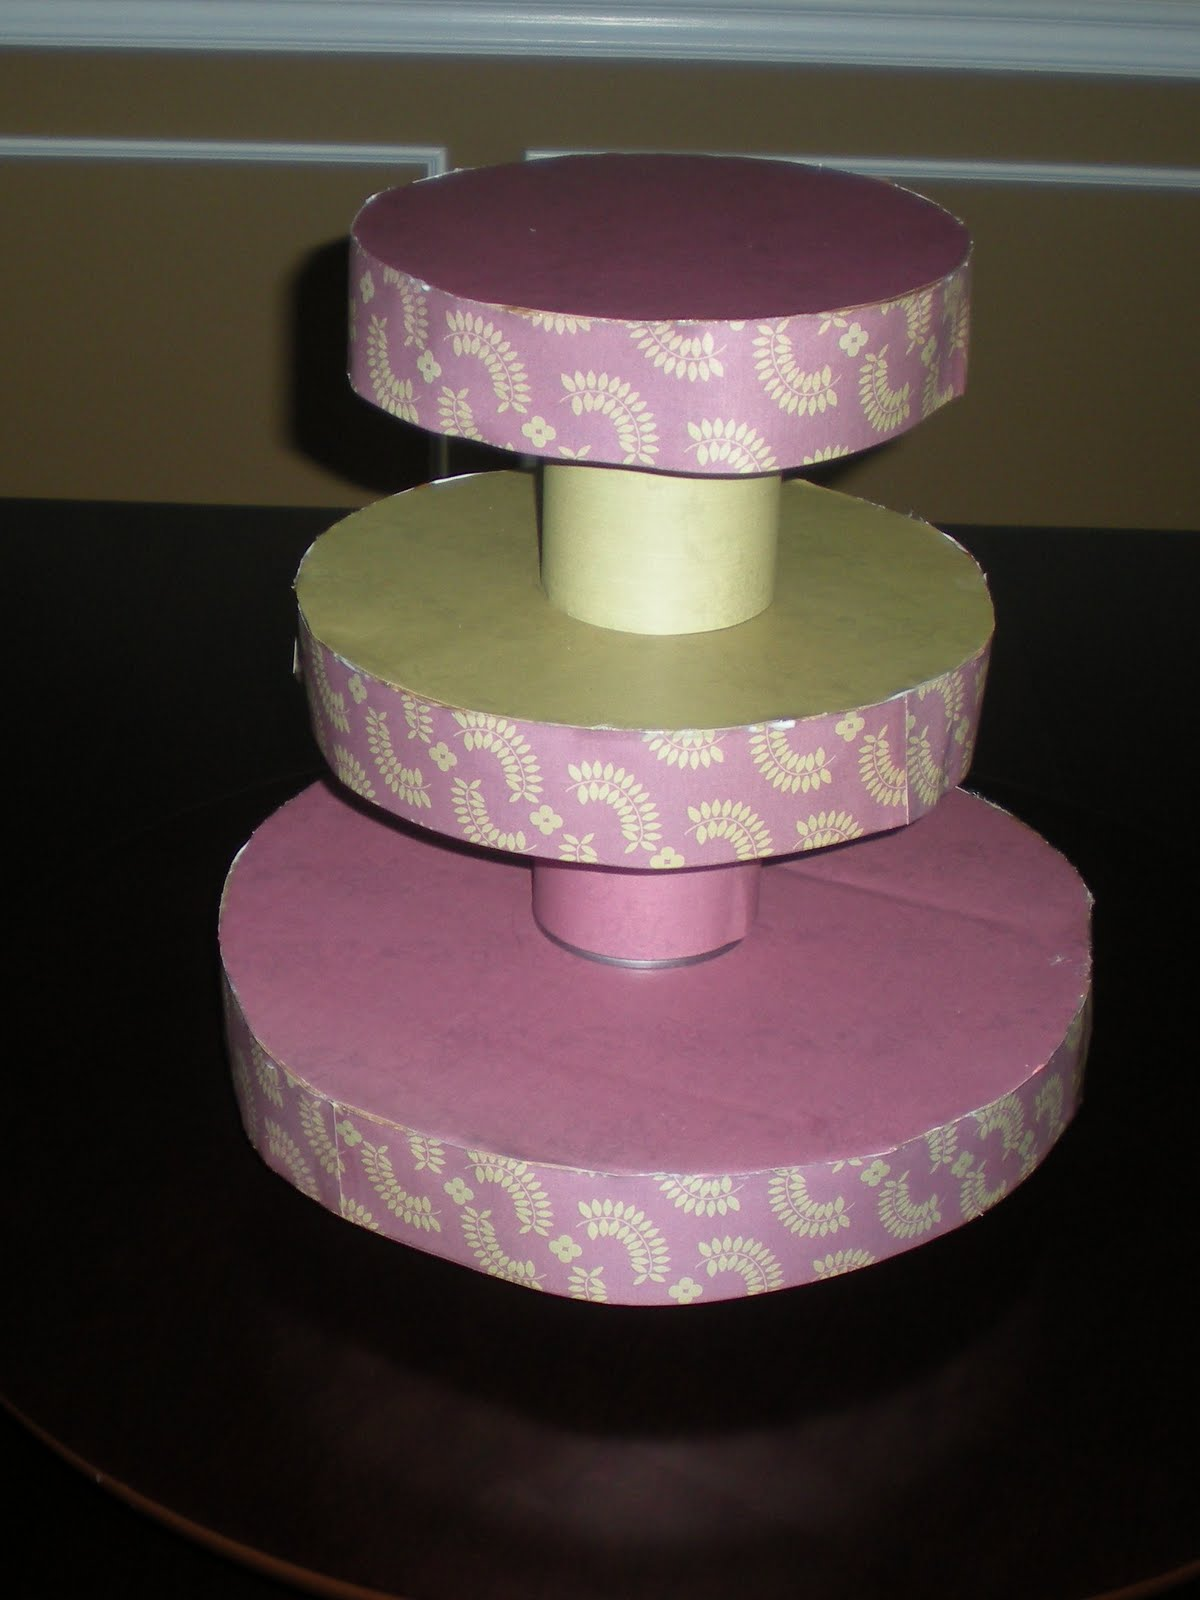 Make It Grand: DIY Cupcake Tower / Stand